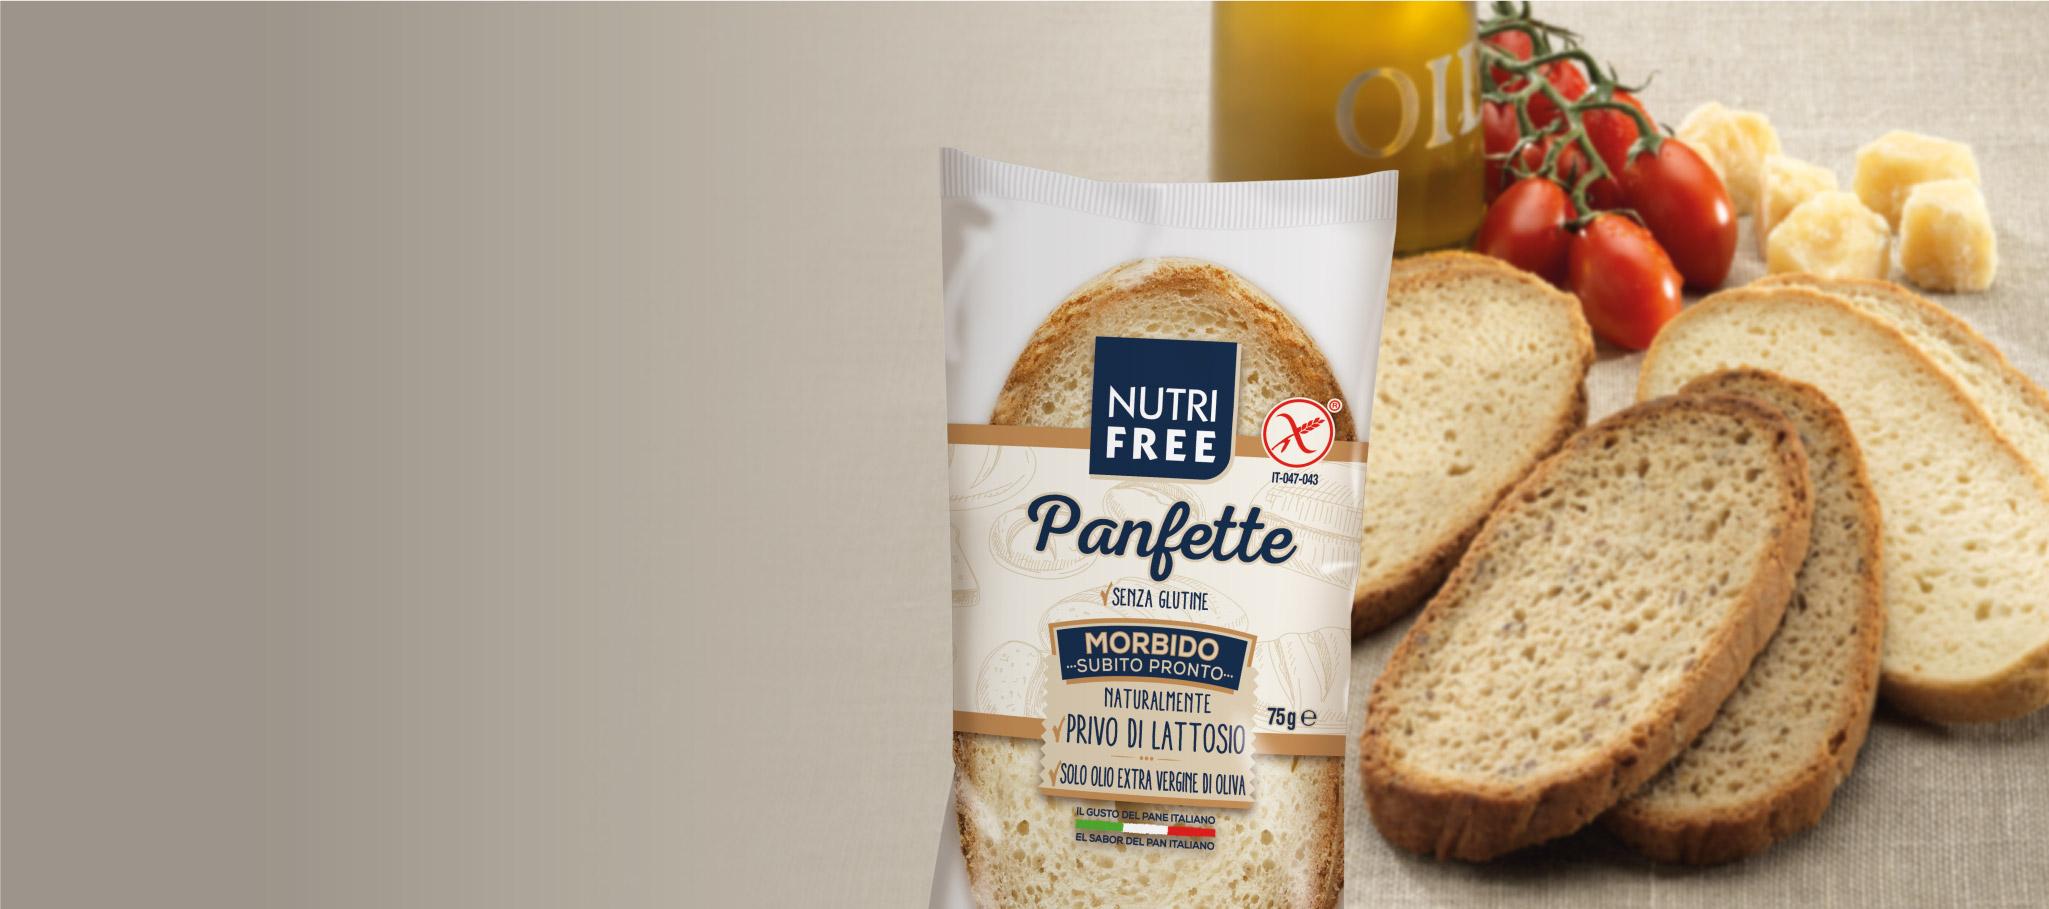 Panfette Nutrifree Food Service